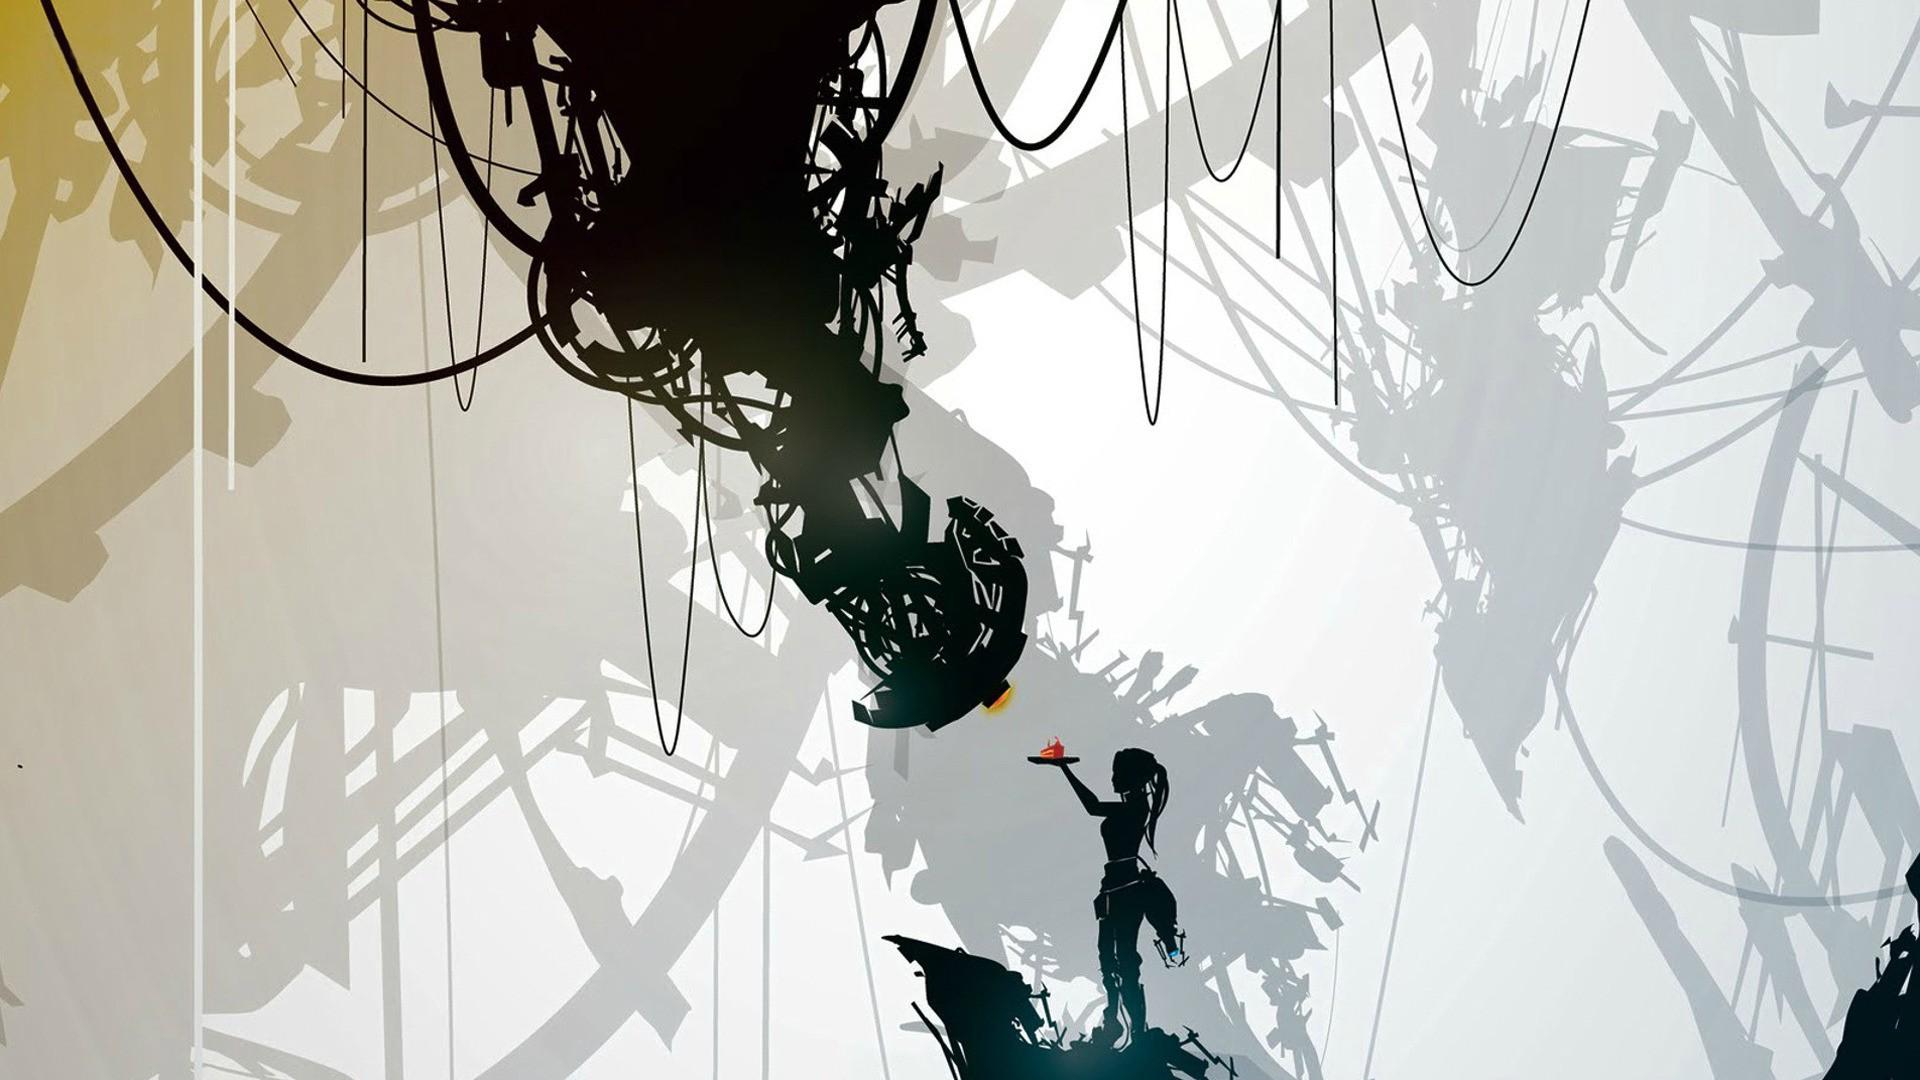 Wallpaper Illustration Graphic Design Roar Movie: Wallpaper : Drawing, Illustration, Video Games, Artwork